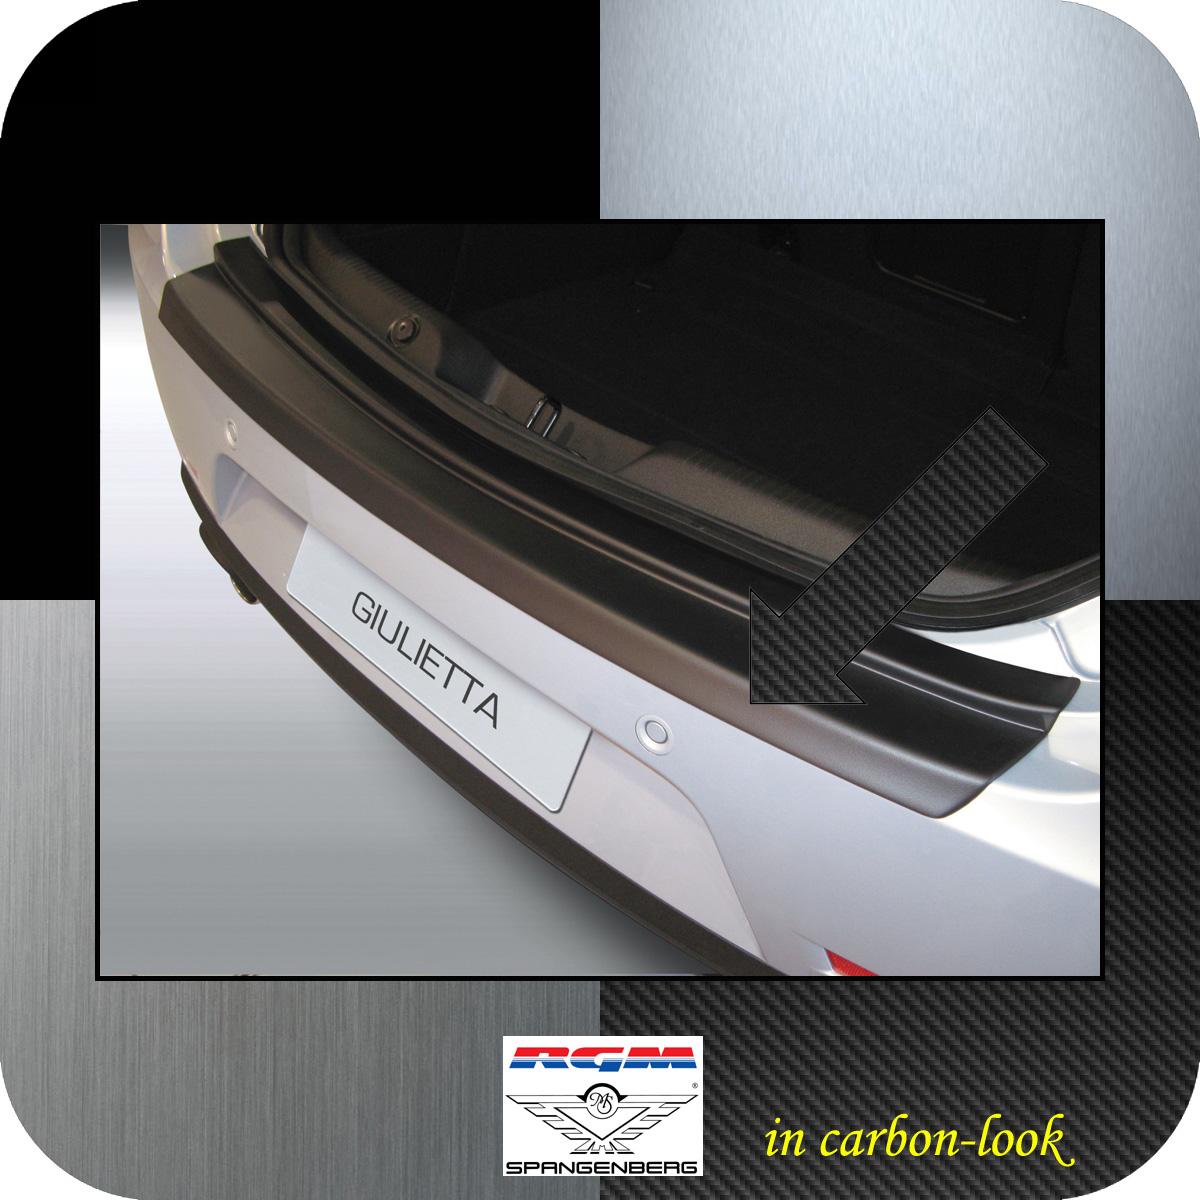 Ladekantenschutz Carbon-Look Alfa Romeo Giulietta III 940 ab 2010- 3509712